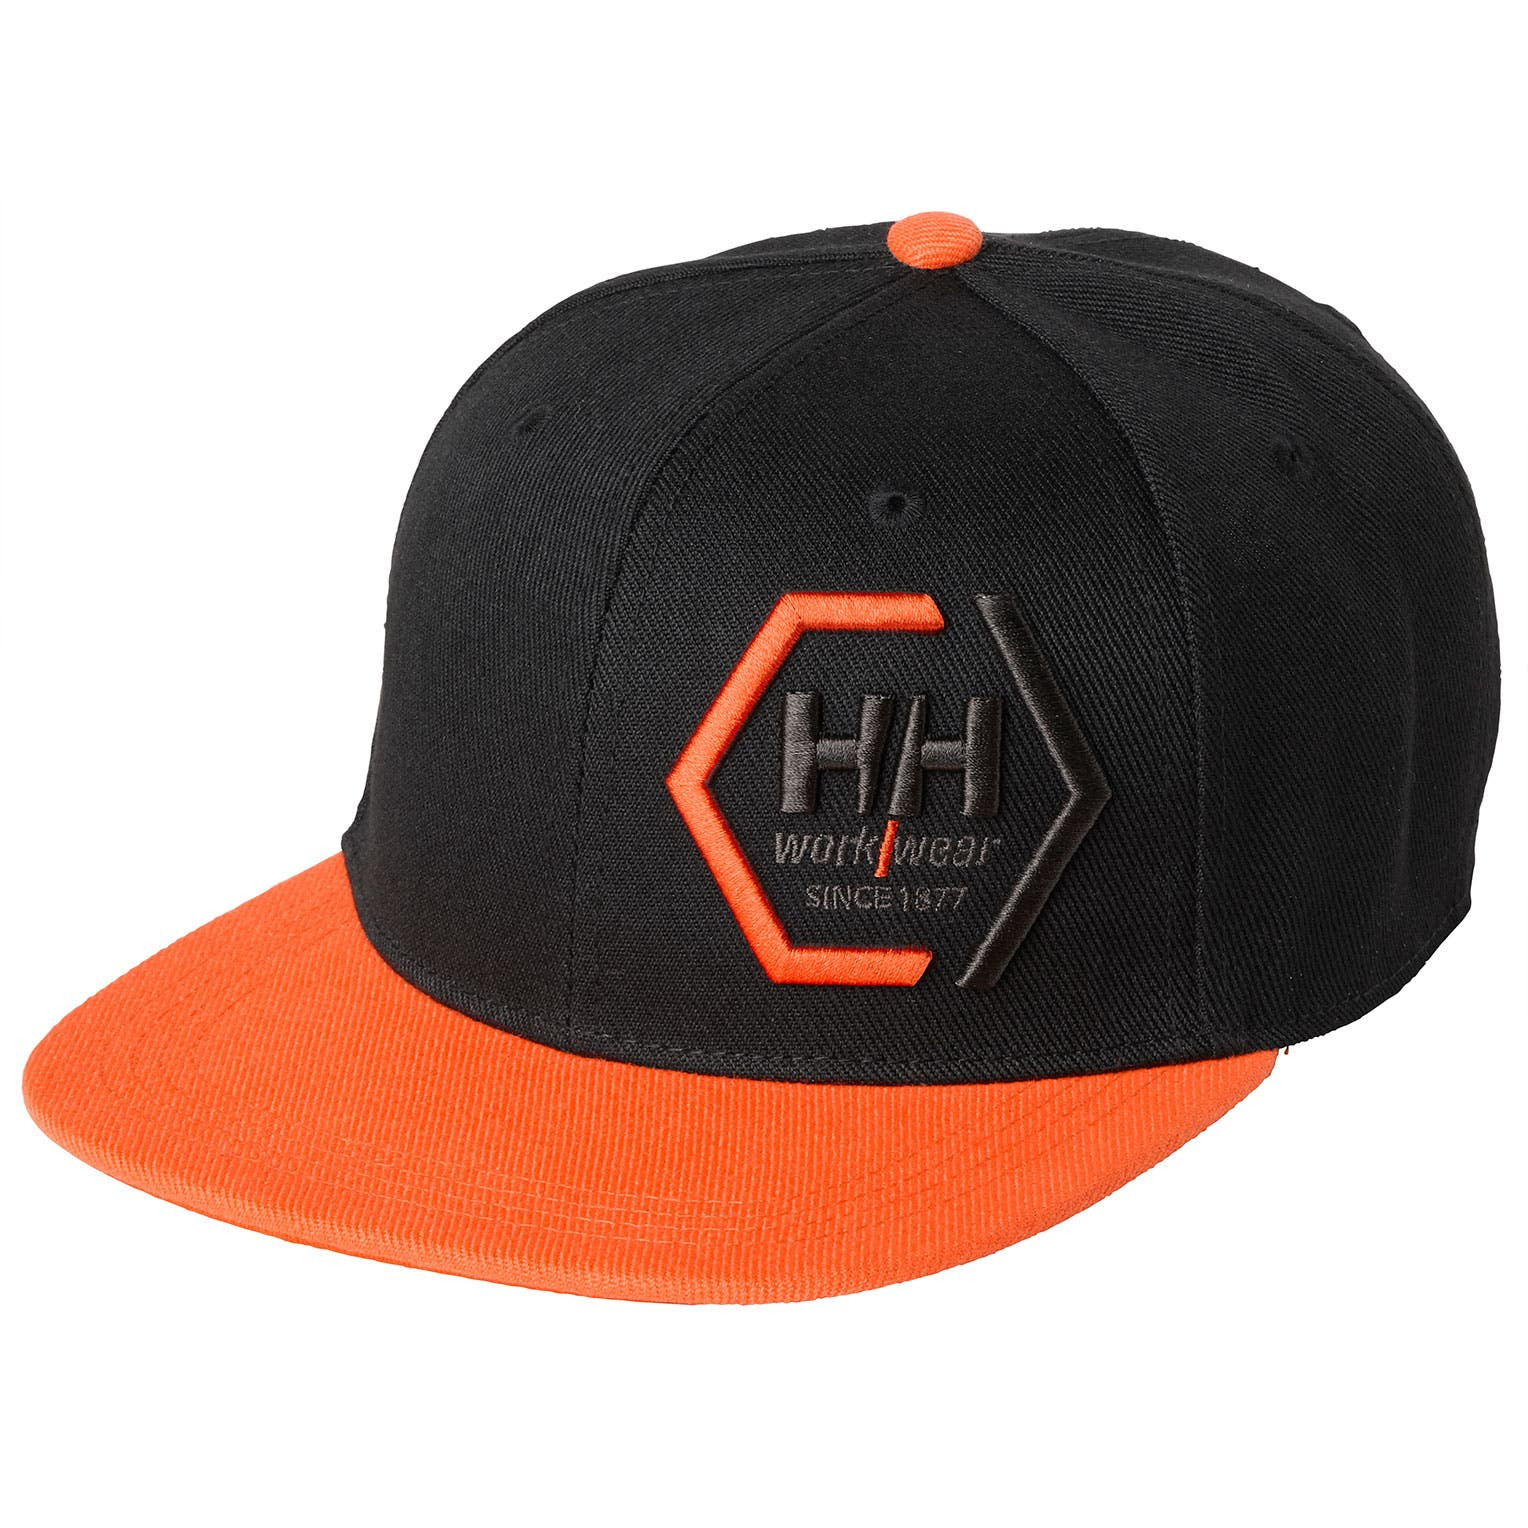 Кепка снепбек Helly Hansen Kensington Flat Brim - 79806 (Black/Orange; STD)